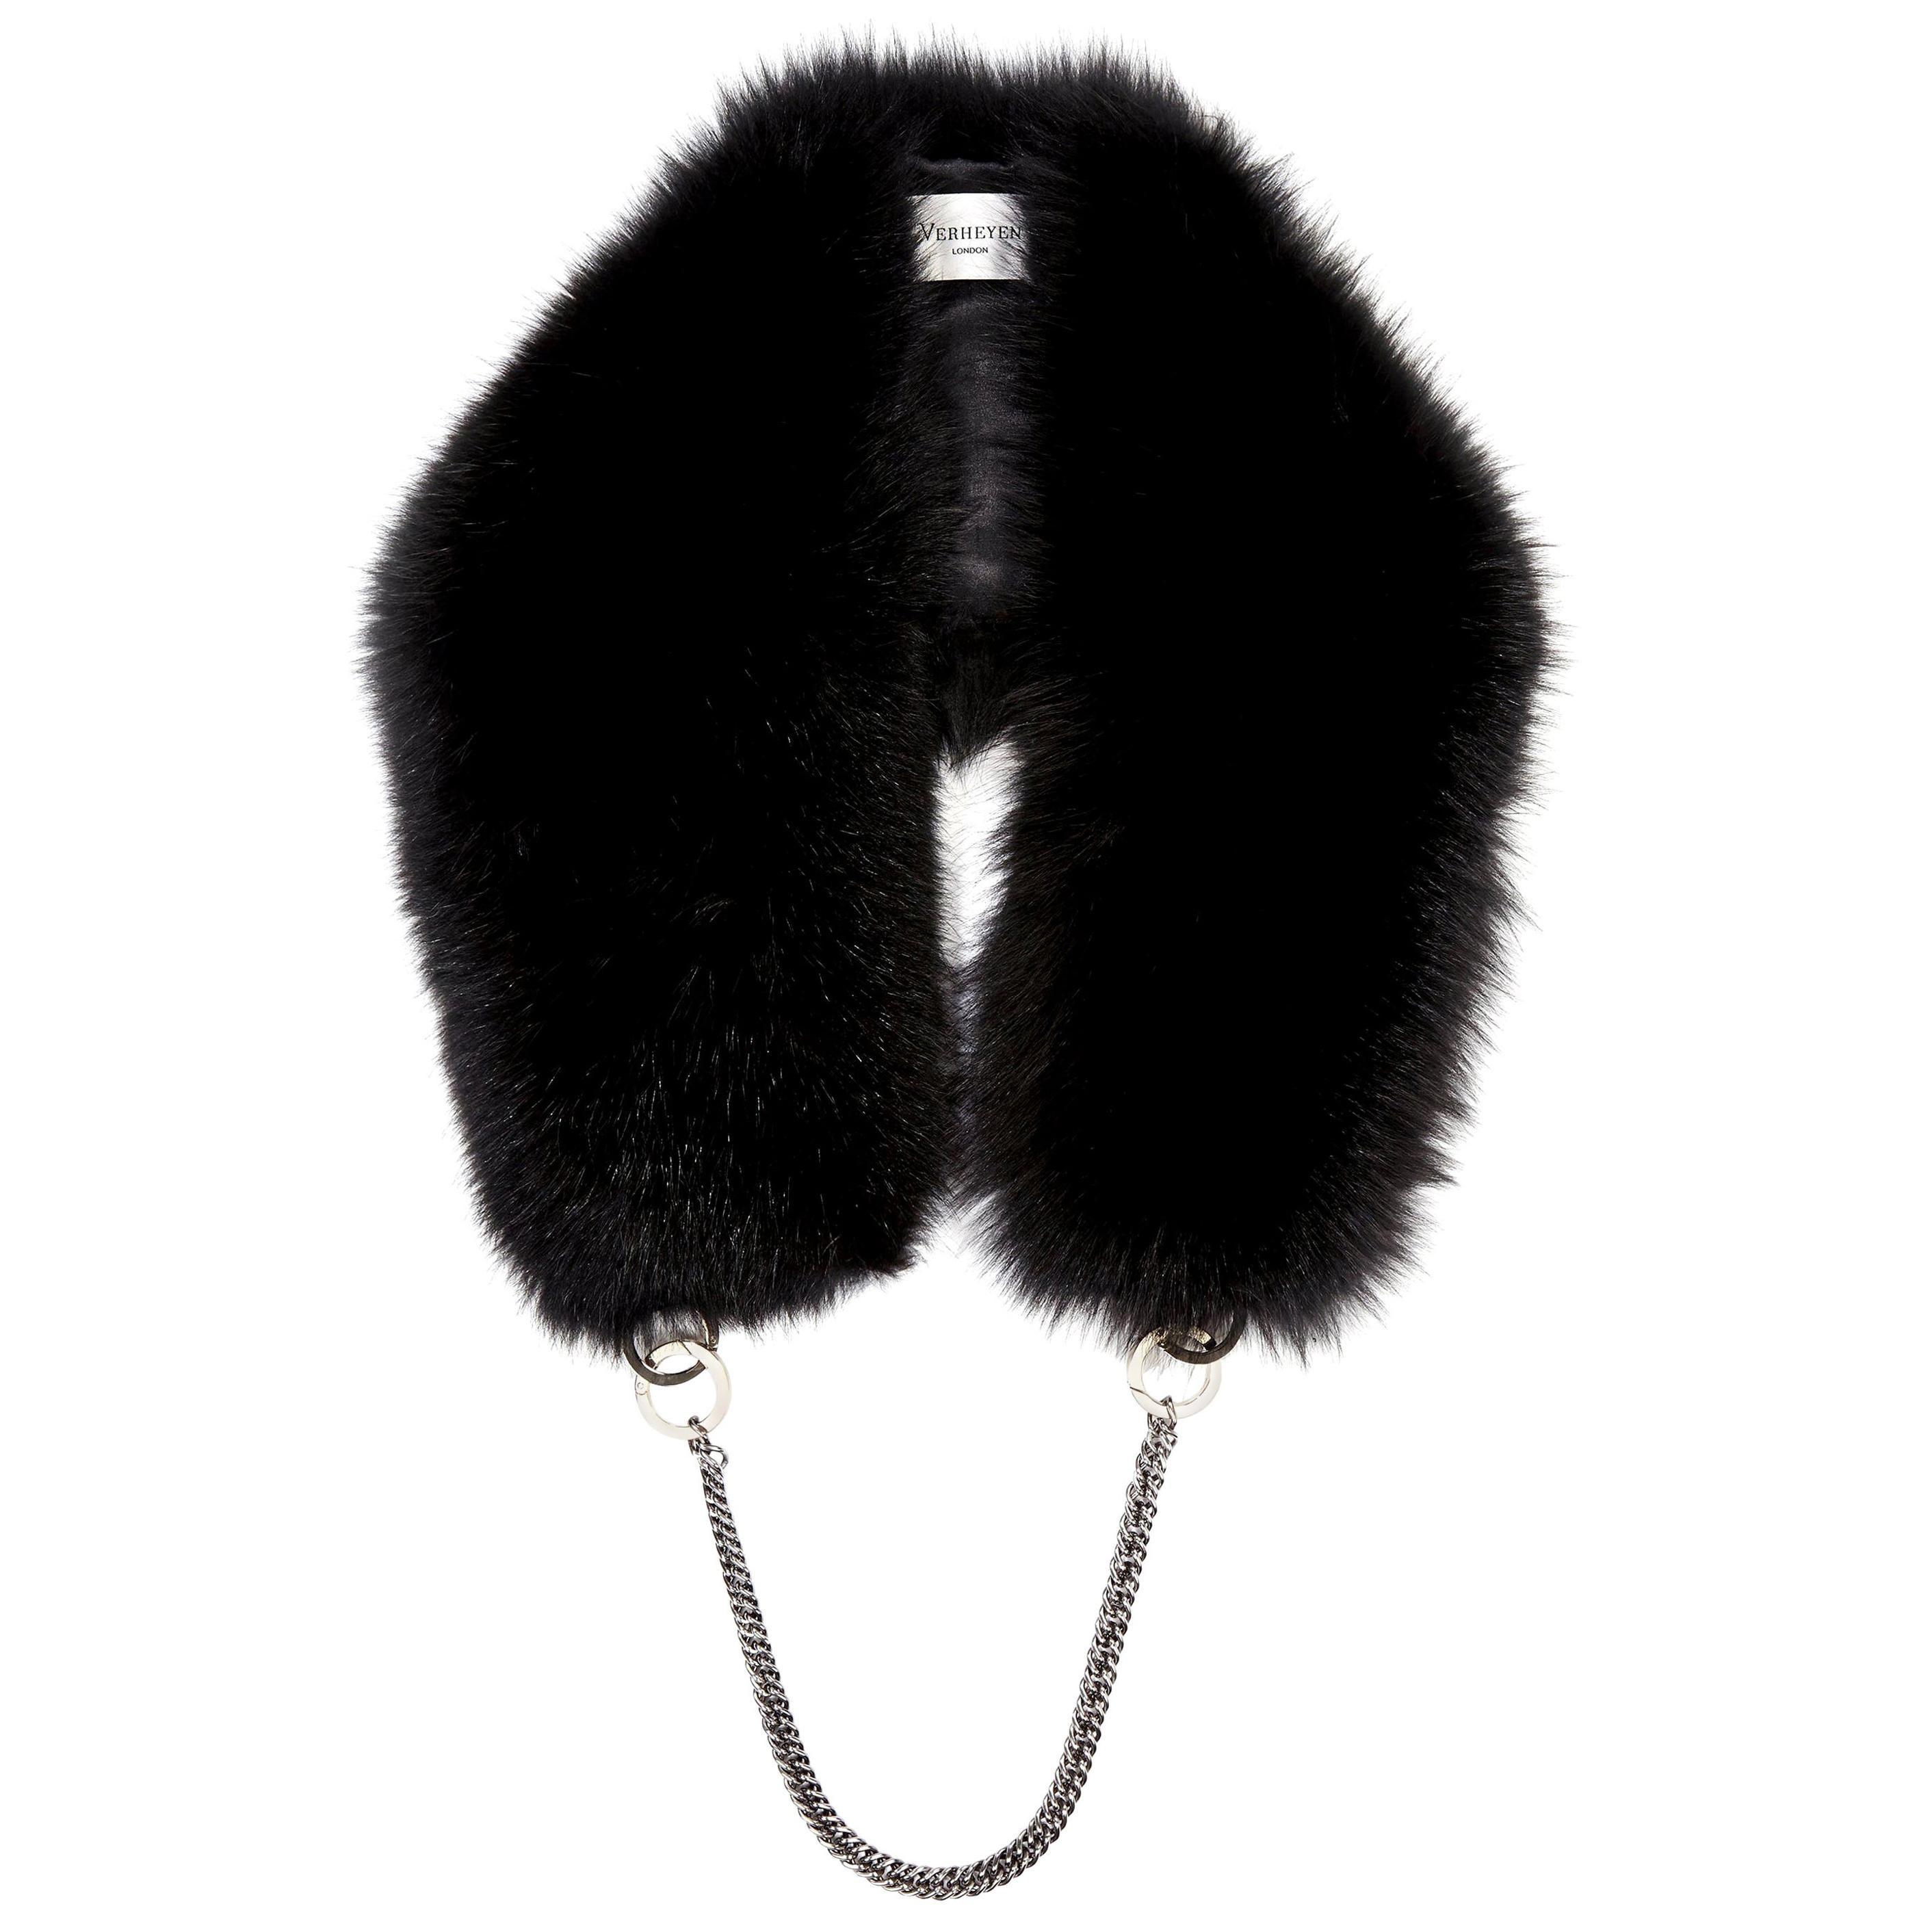 Verheyen London Chained Stole in Black Fox Fur & Silk Lining with Chain